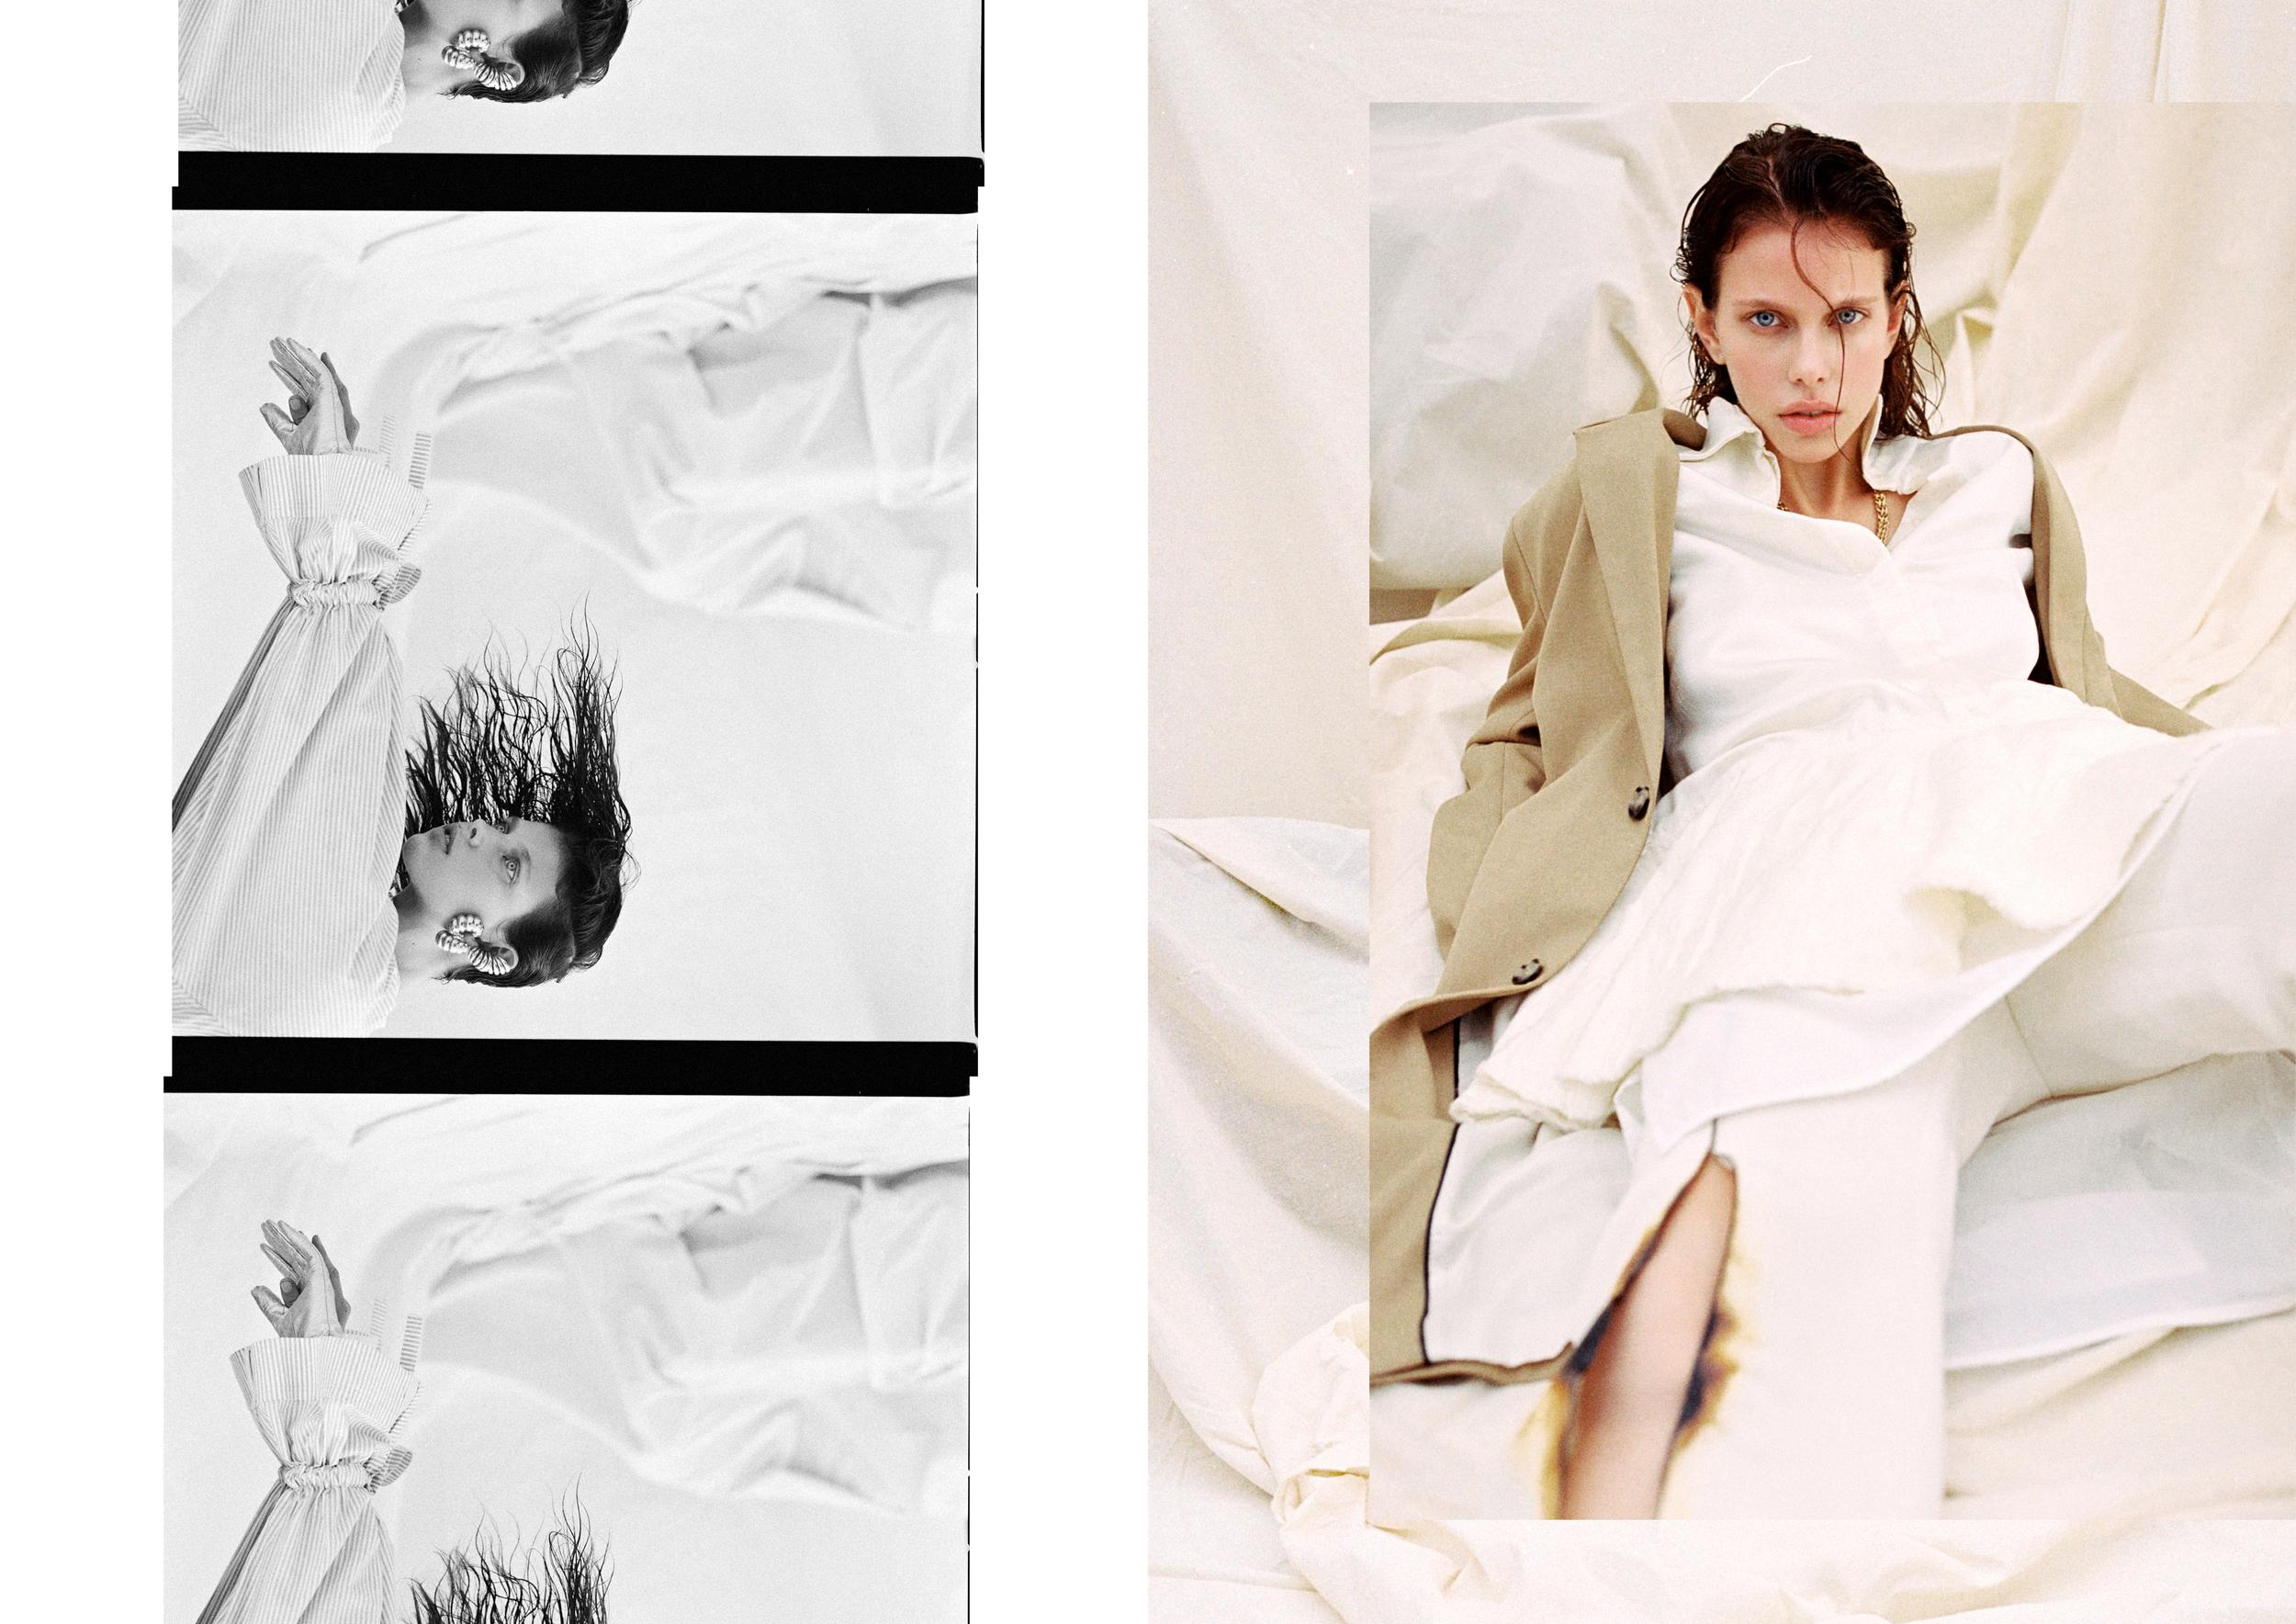 Blanc Canvas by Cristian Davila Hernandez